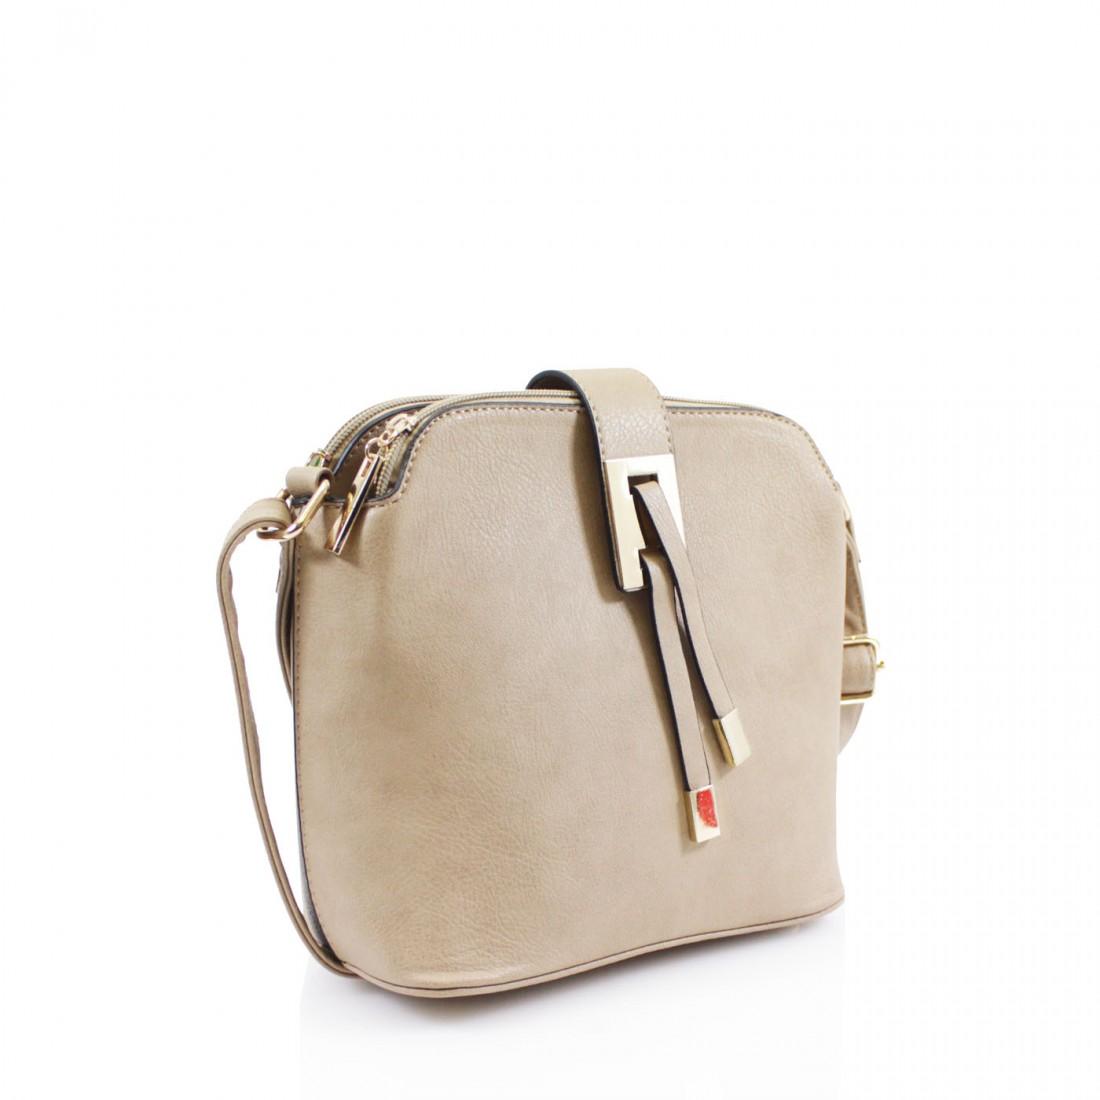 Triple Pocket Cross Body Handbag - Various Colours